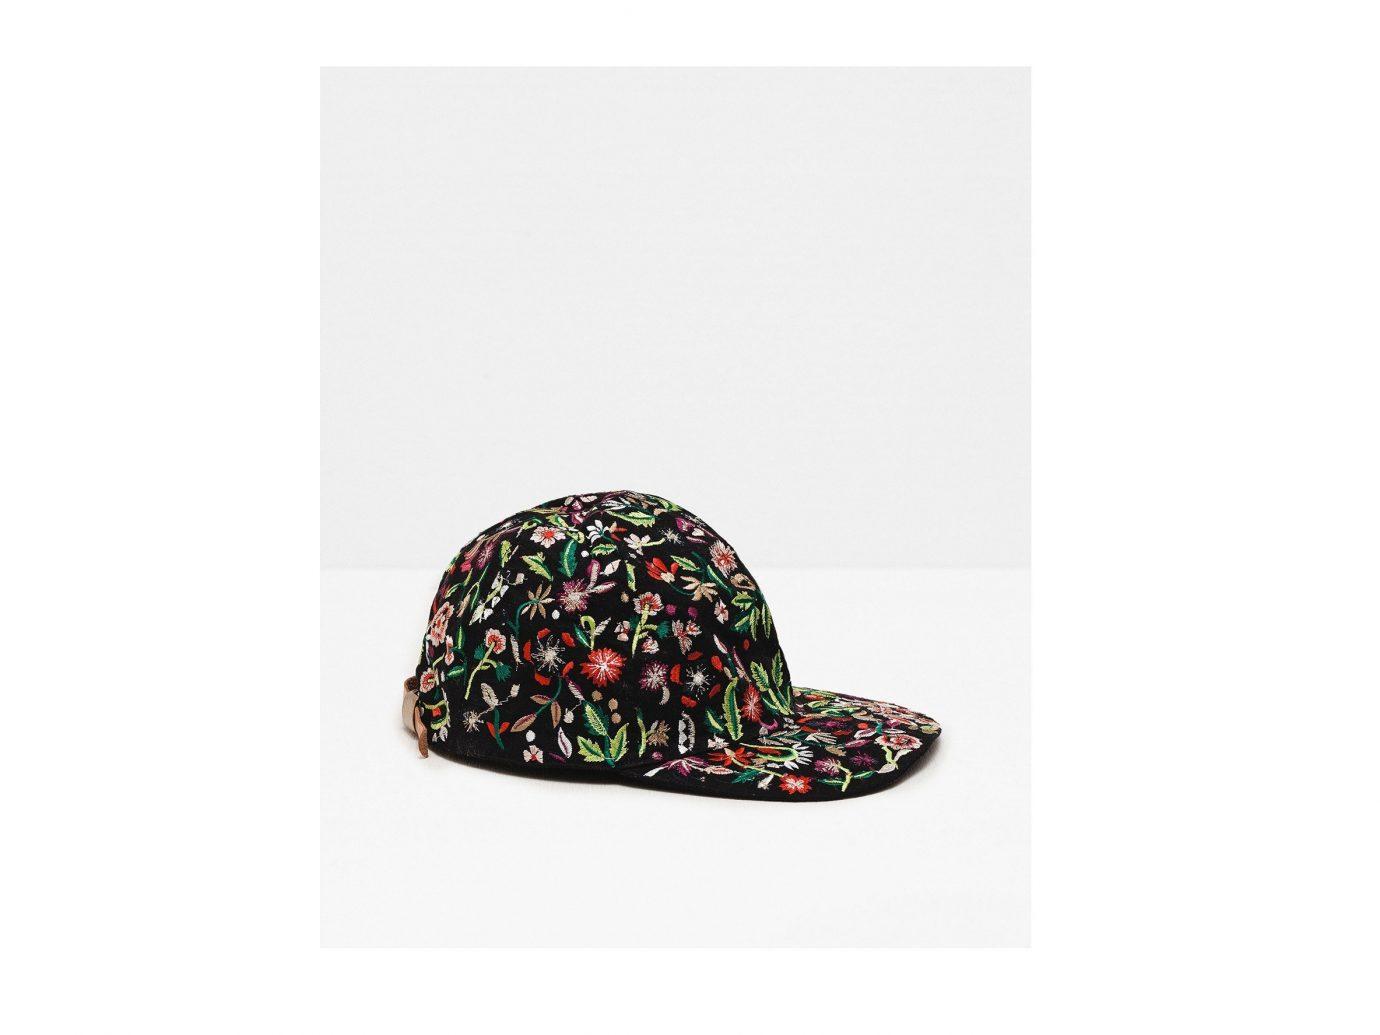 caa121b9880 Style + Design clothing footwear cap pink fashion accessory hairstyle  pattern shoe magenta Design hat headgear